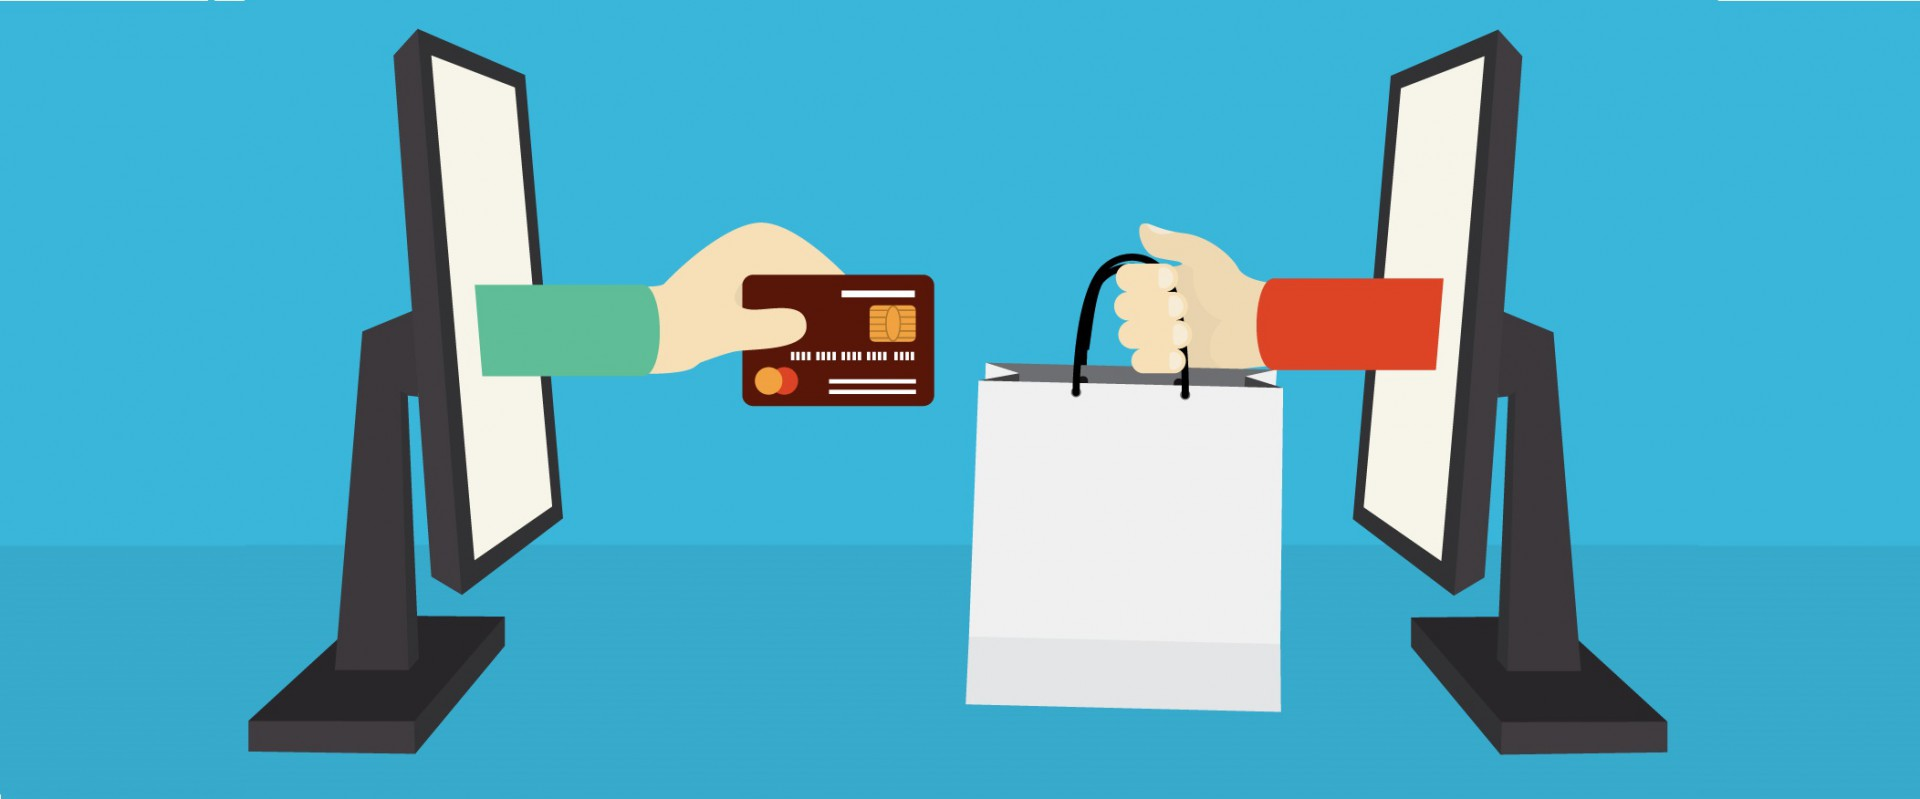 ecommerce brasil crescimento - fuja da crise - lojas online - agencia digital